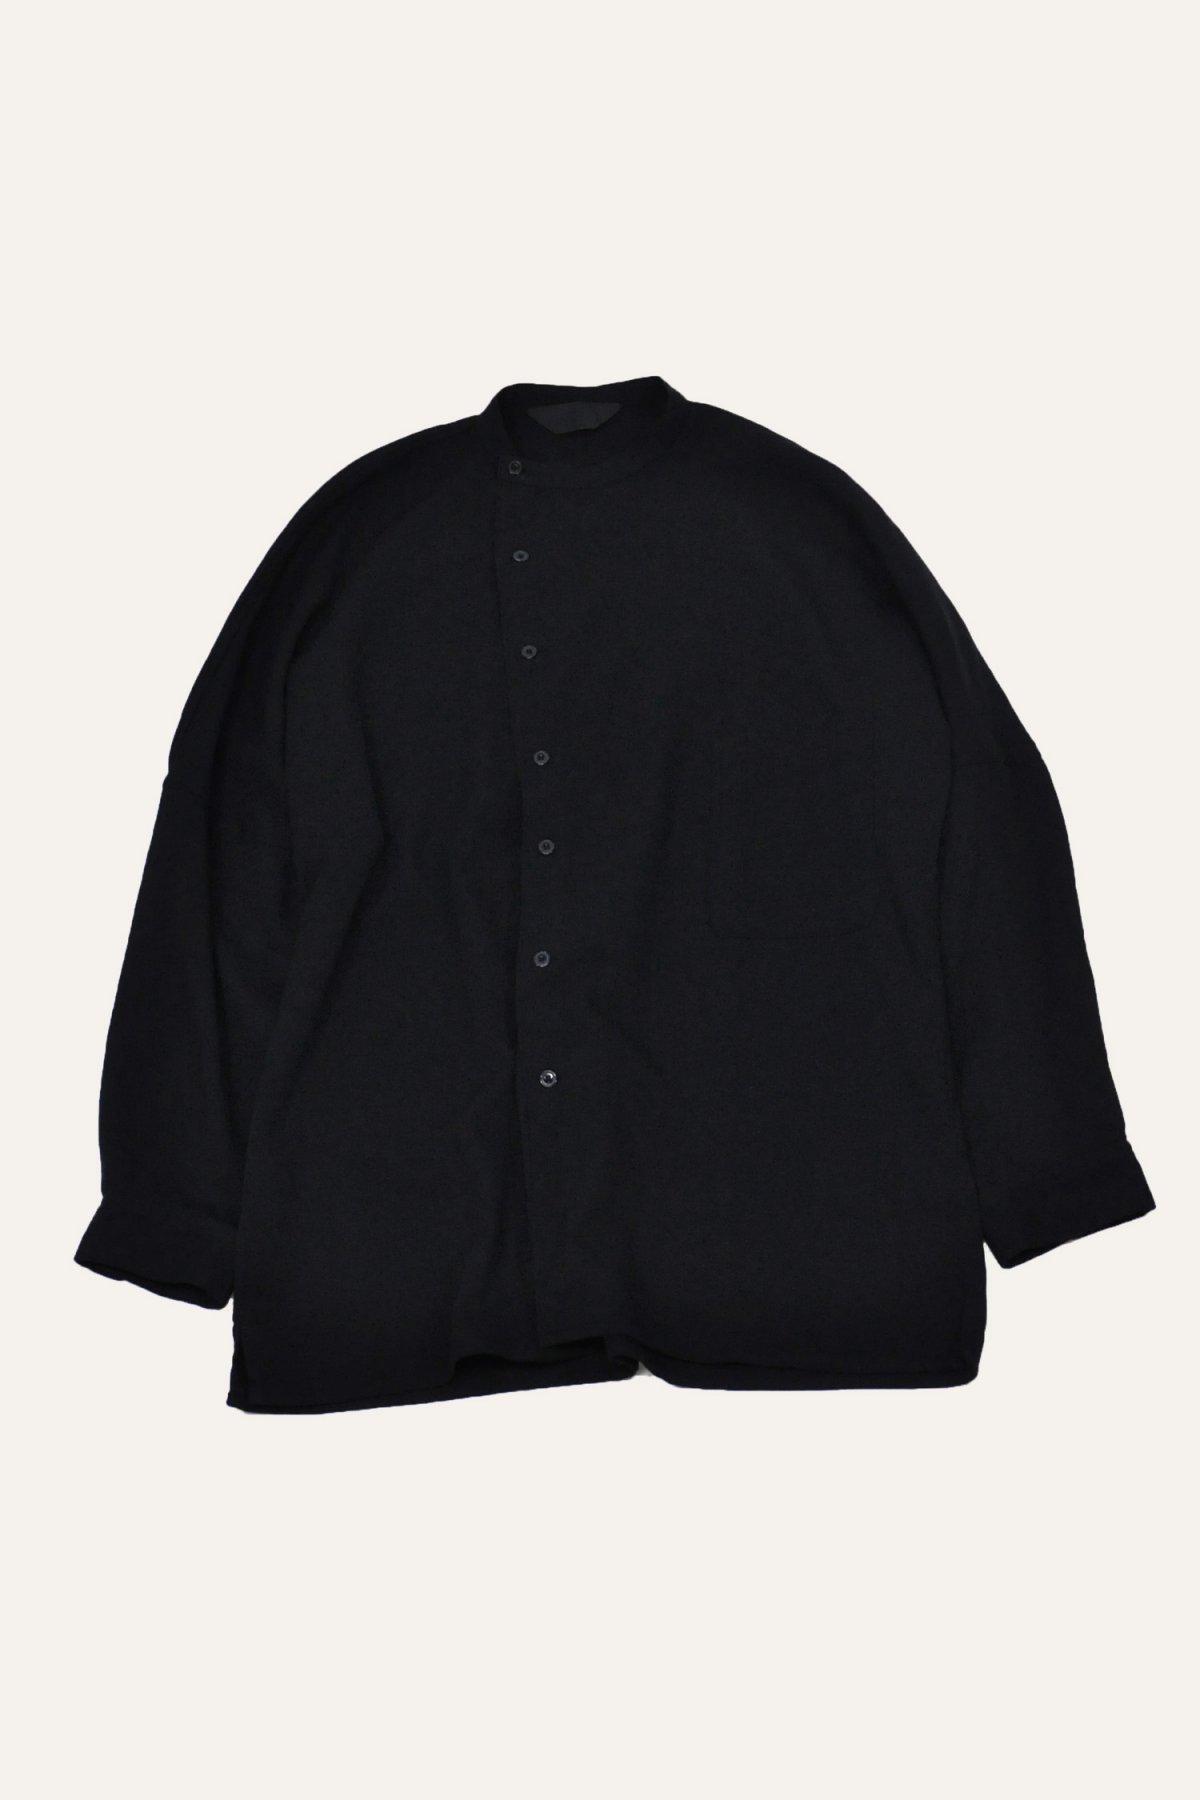 DOLMAN SLANT SHIRT – BLACK